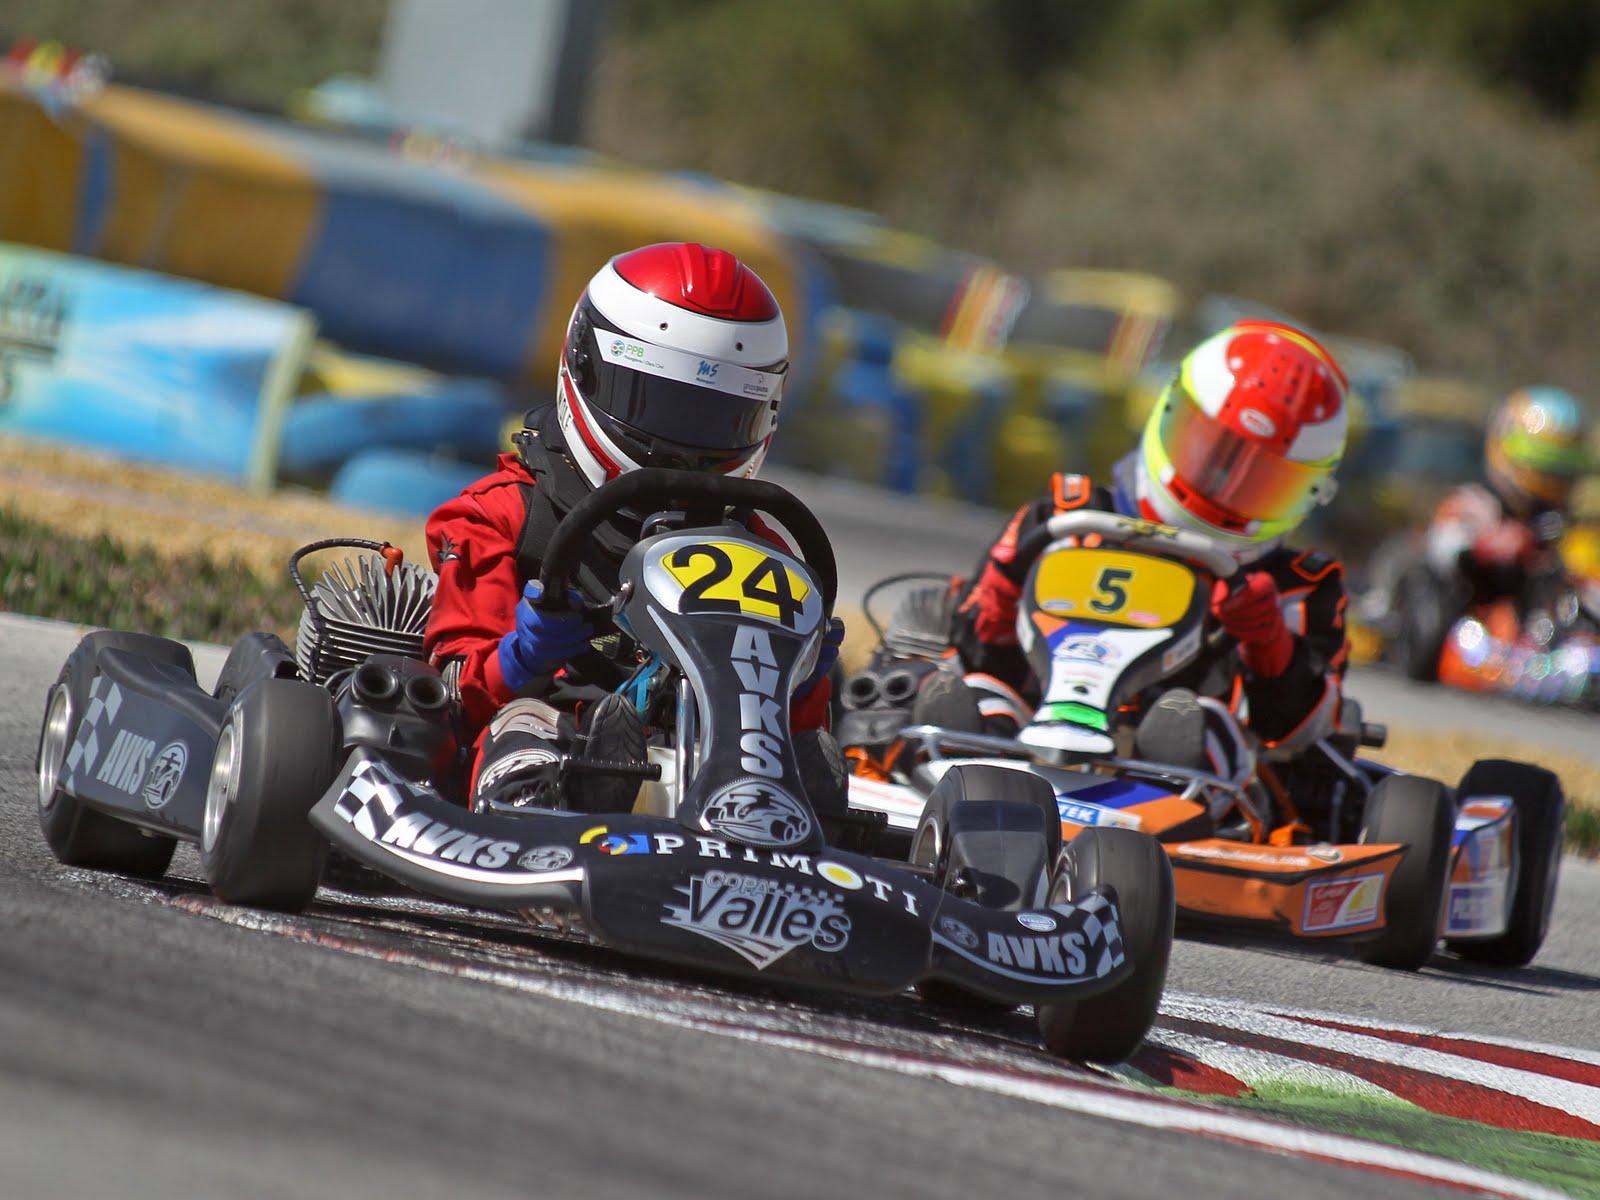 Circuito Karting : Benferri karting club abril